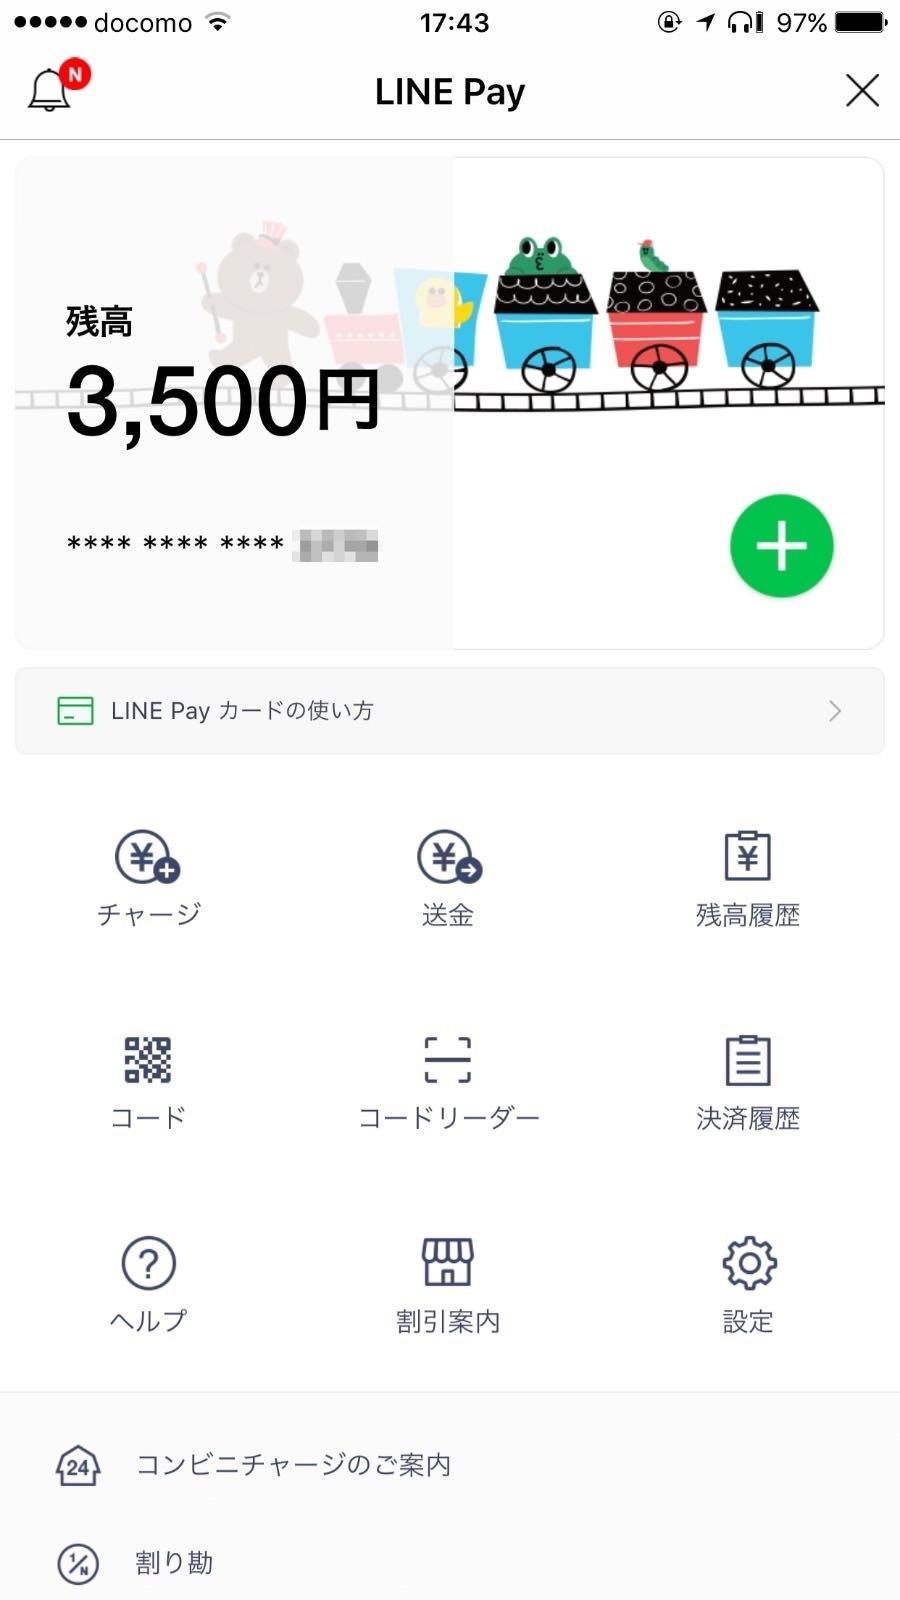 Line pay card 9346